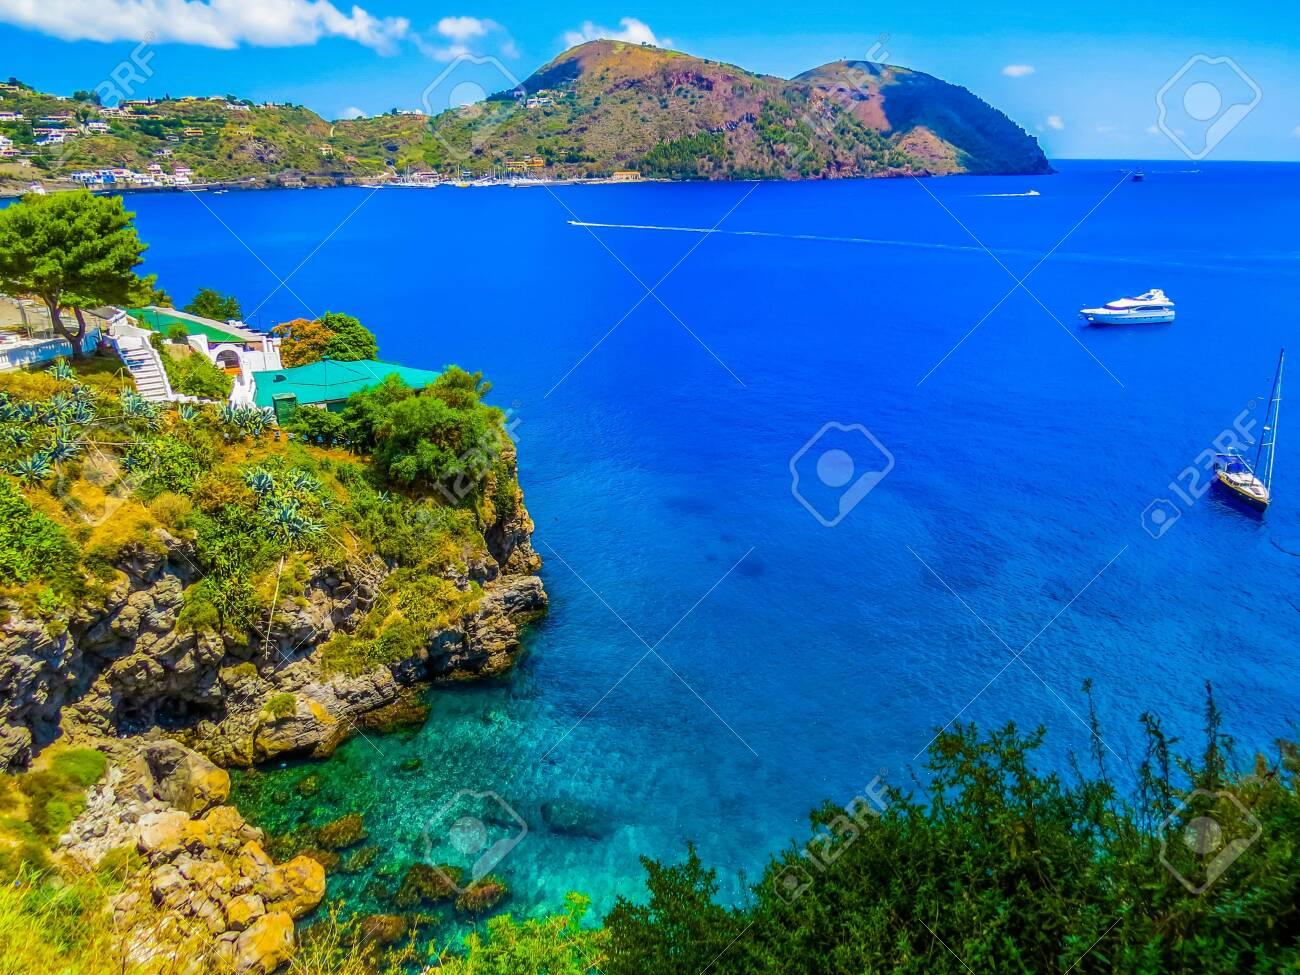 View of the Lipari Island, Italy - 144783939